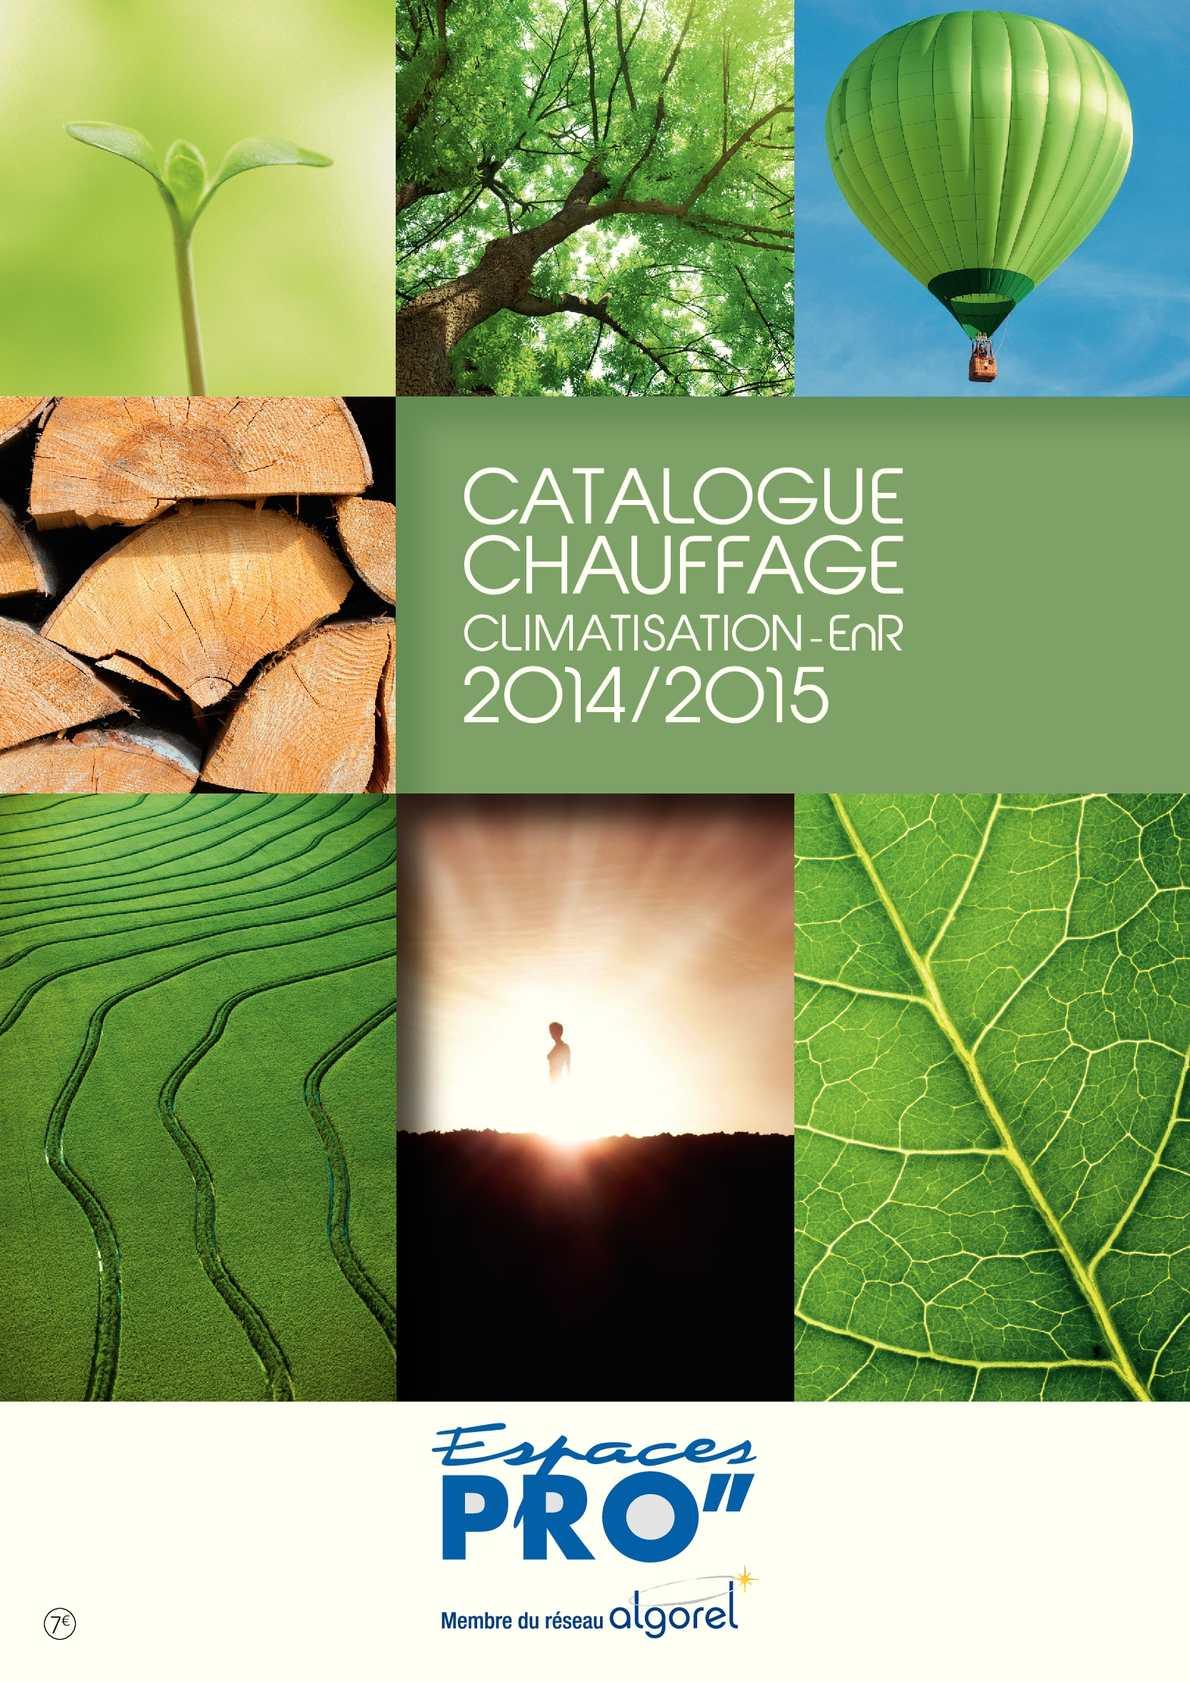 Calameo Catalogue Chauffage 2014